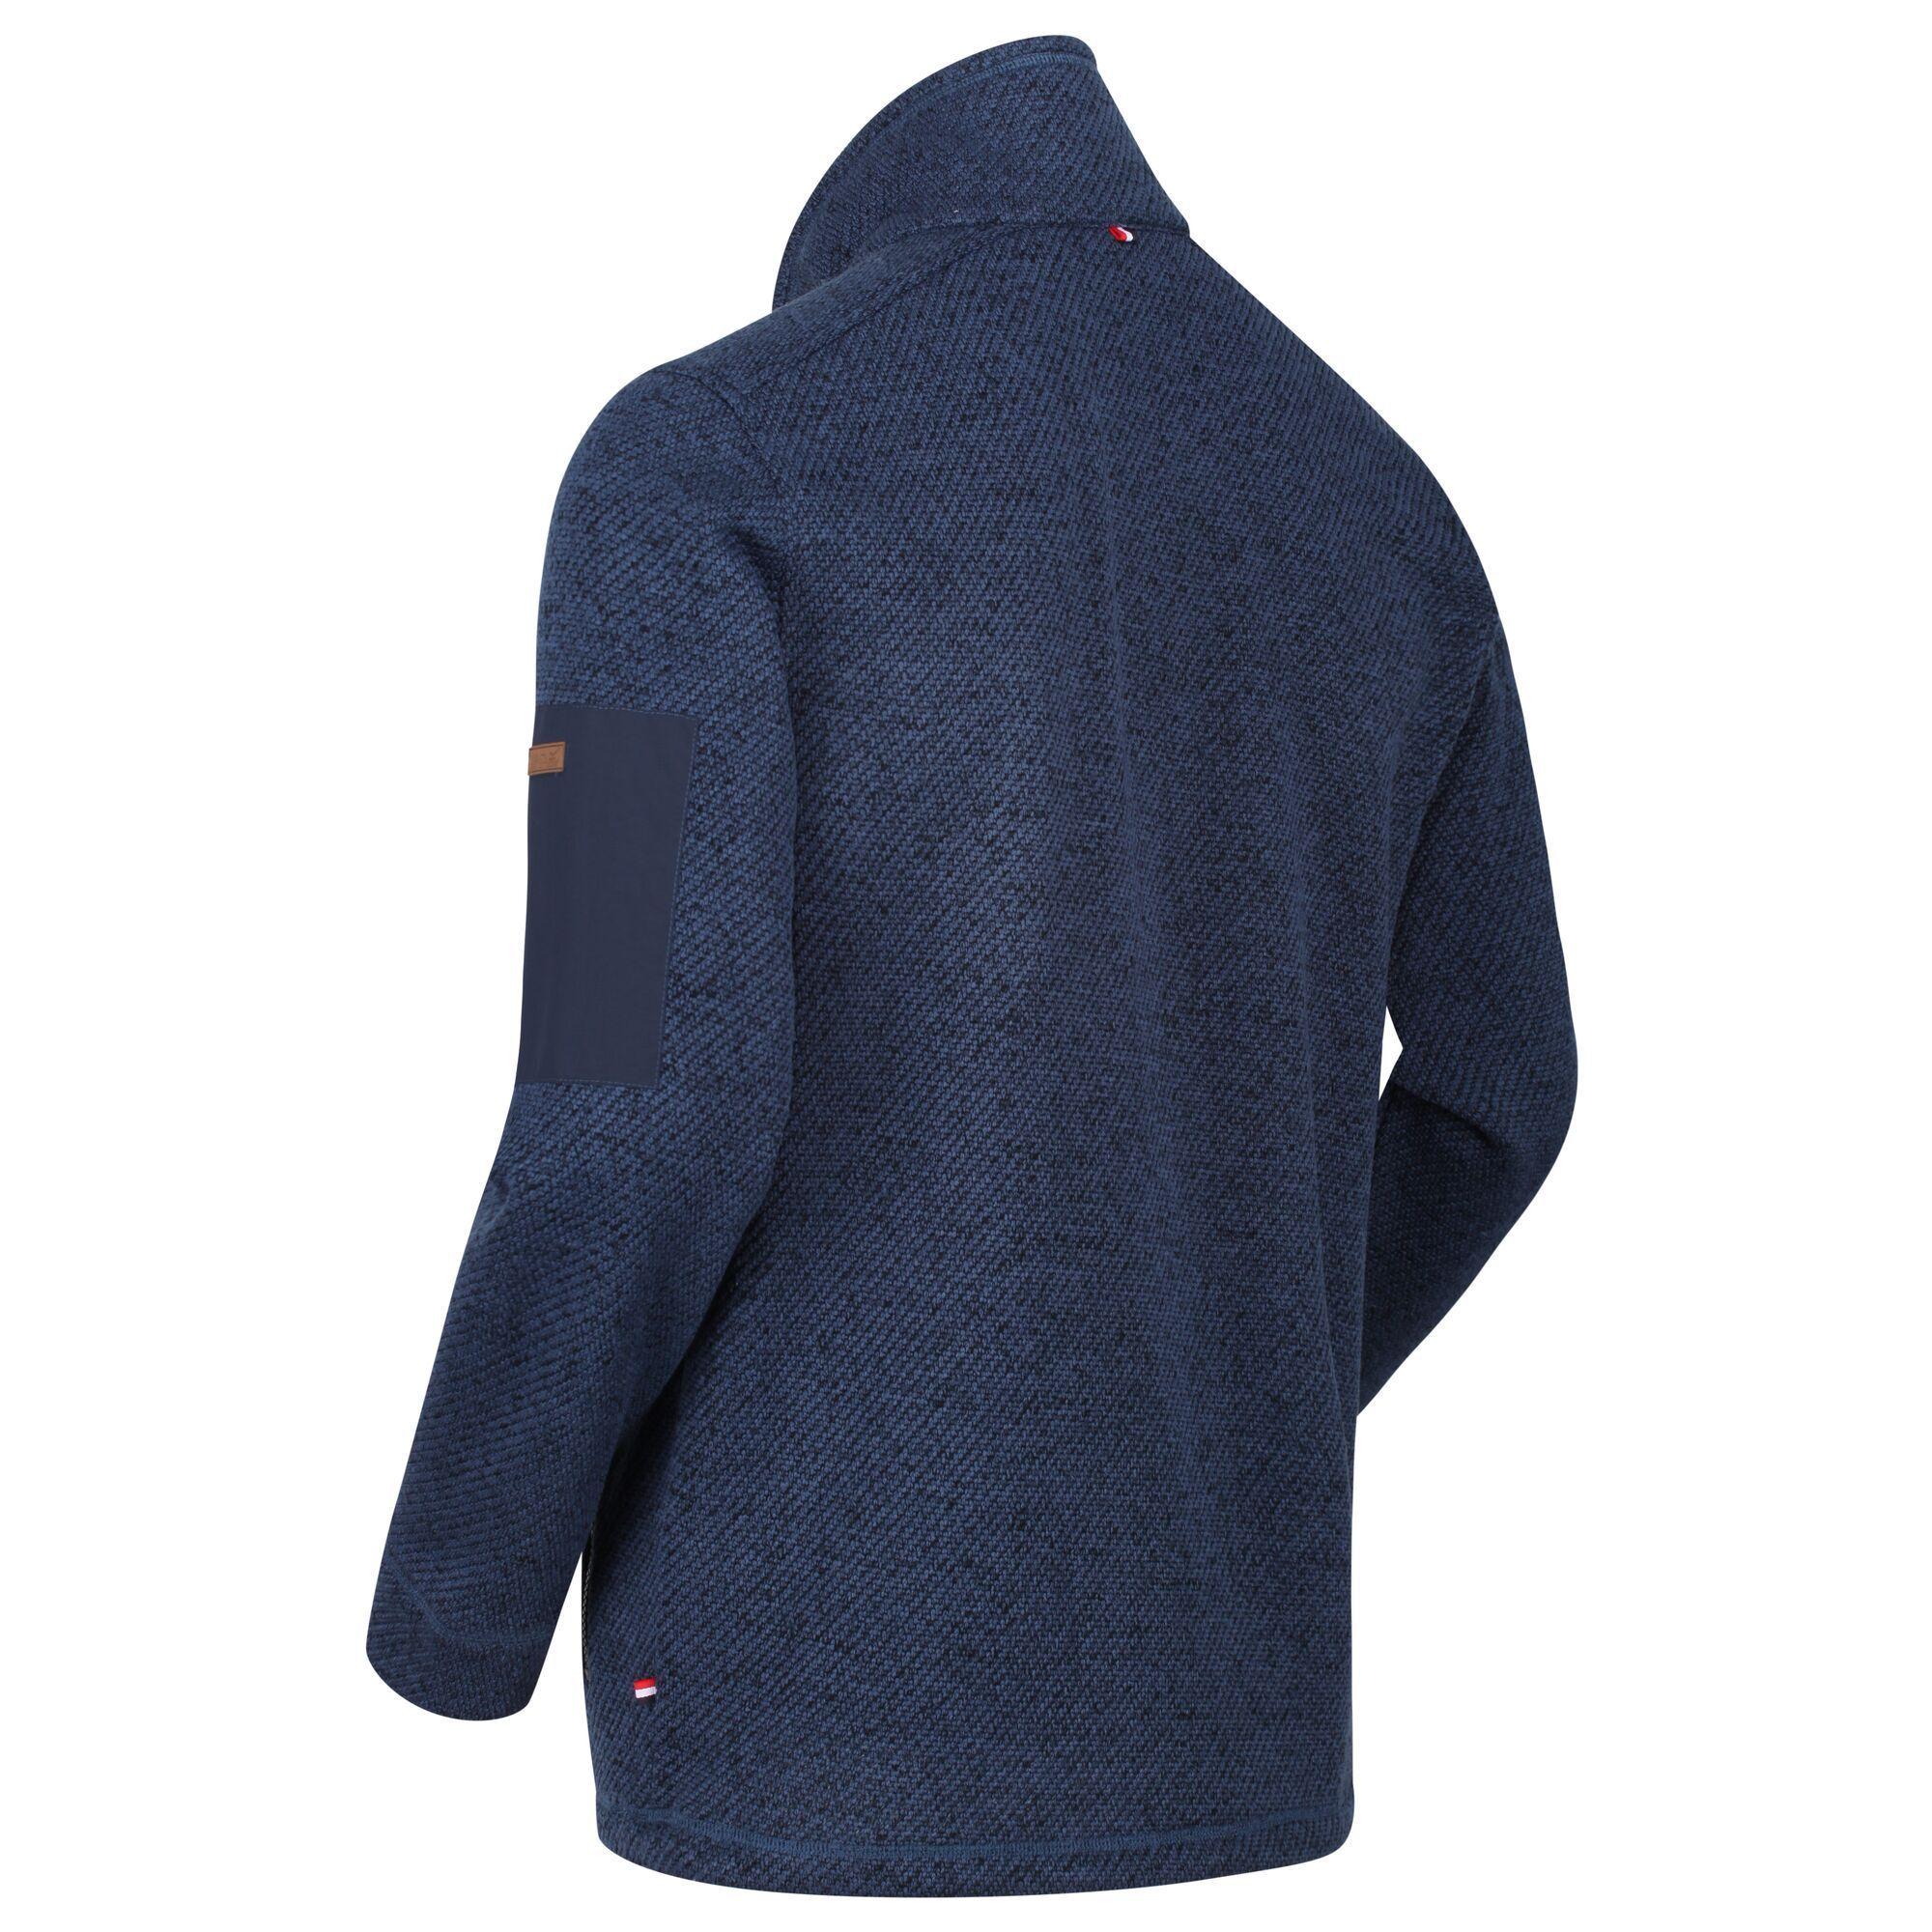 Regatta Mens Garret Full Zip Fleece